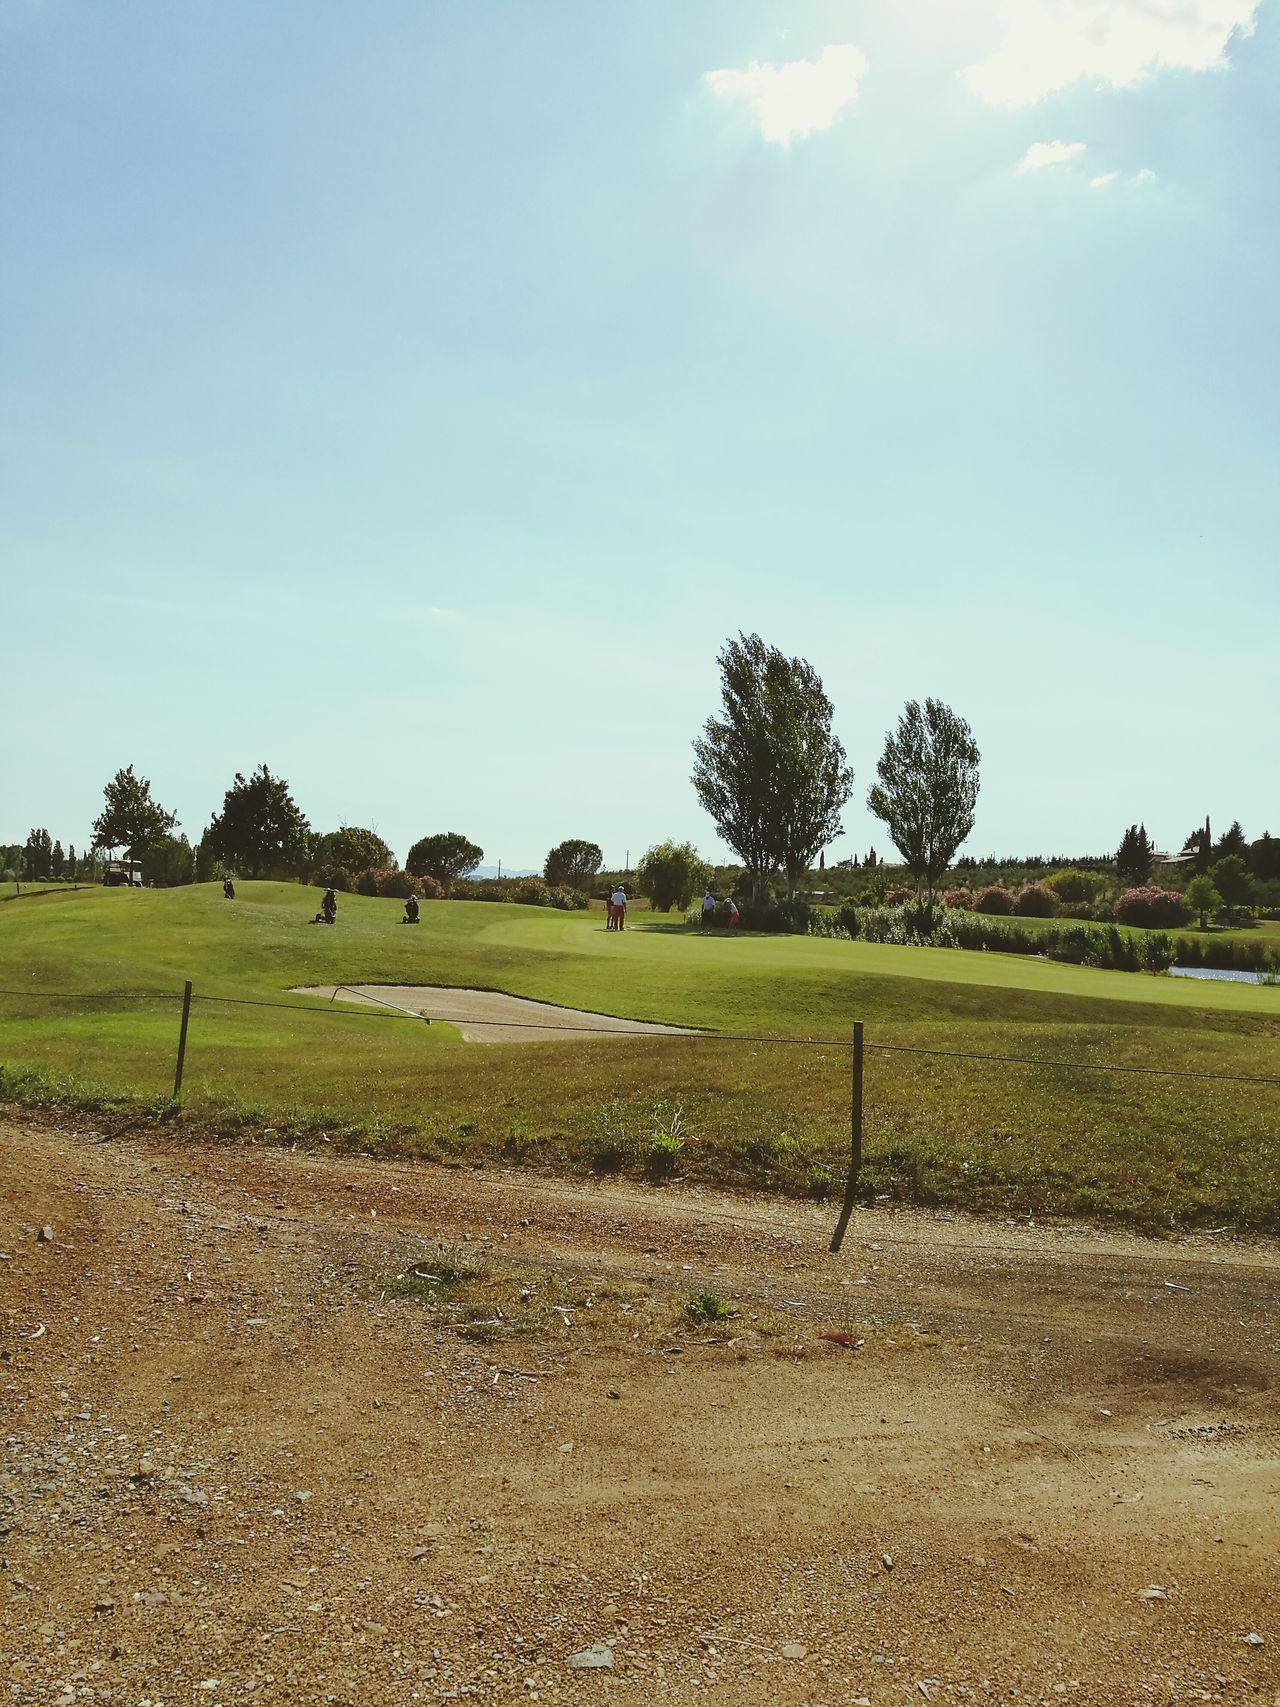 Golf Pelagone Gavorrano, Toskana Gavorrano Golfresort Toscana Maremma Italy Hello World Enjoying Life Eyeem Photography Wonderful